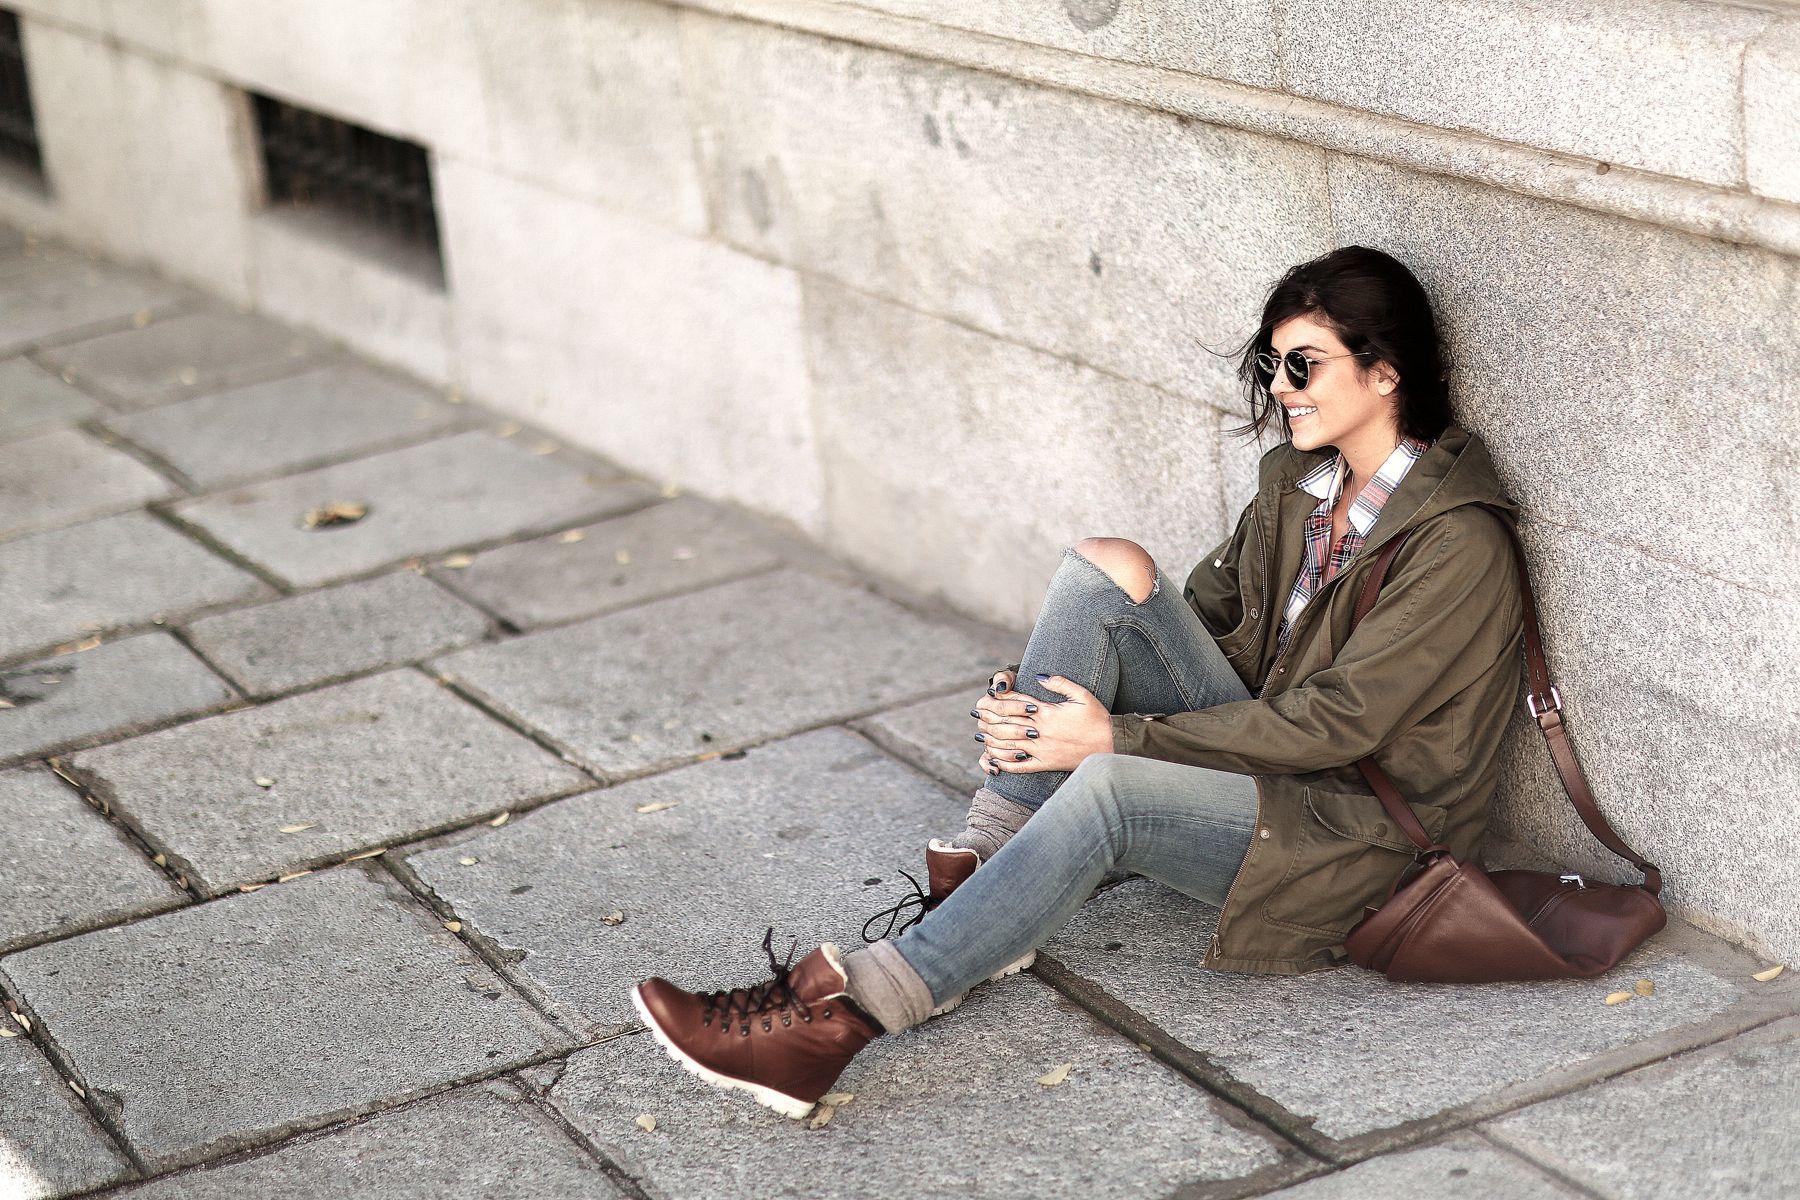 trendy-taste-look-outfit-street-style-trekking-tendencia-botas-parka-camisa-cuadros-plaid-shirt-fall-otoño-4